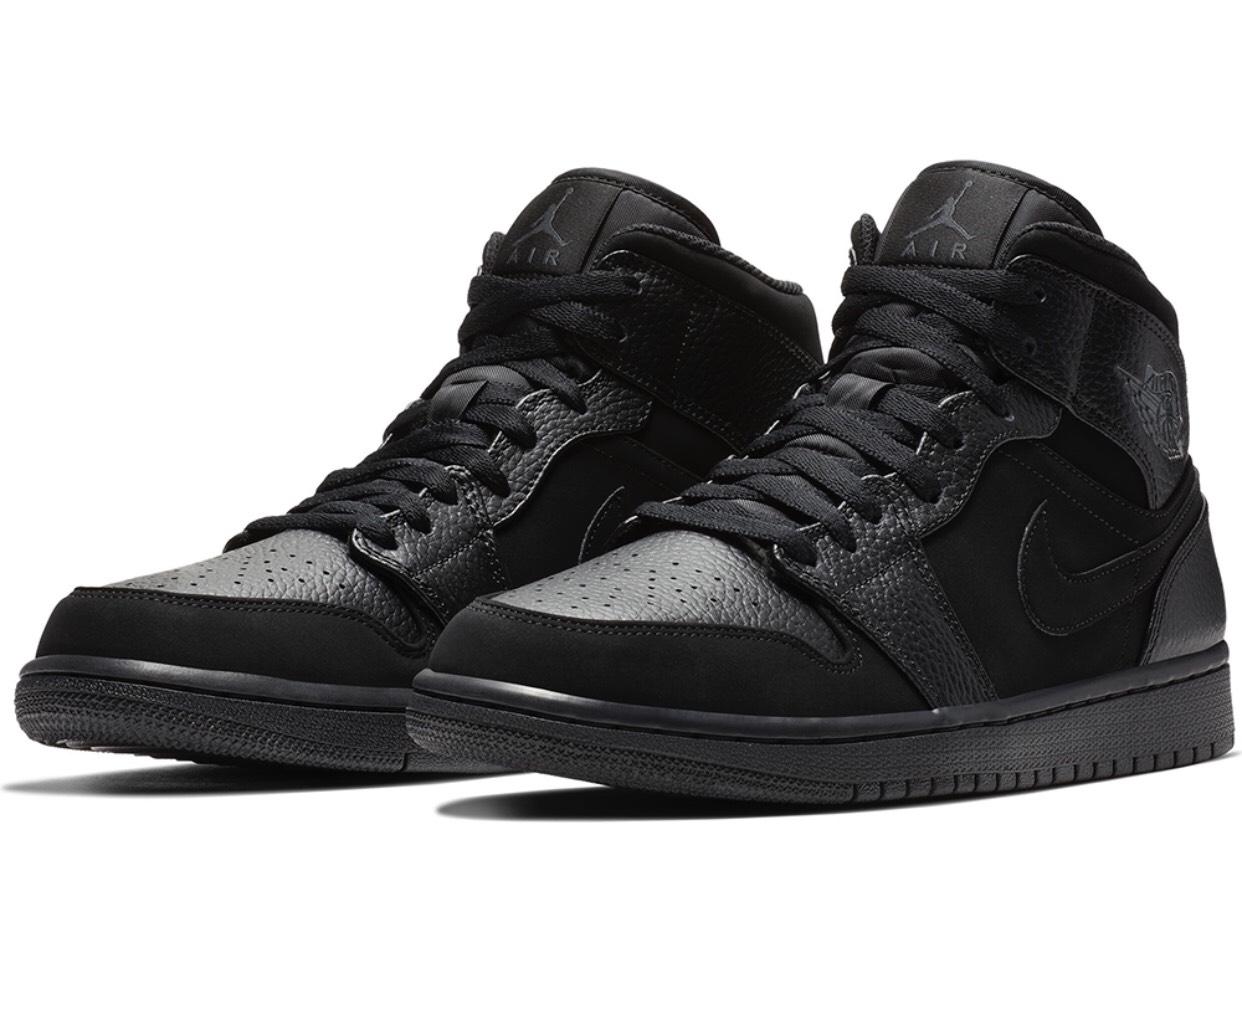 Nike Air Jordan 1 MID czarne 554724-064 rozmiary 44; 44,5; 47; 47,5